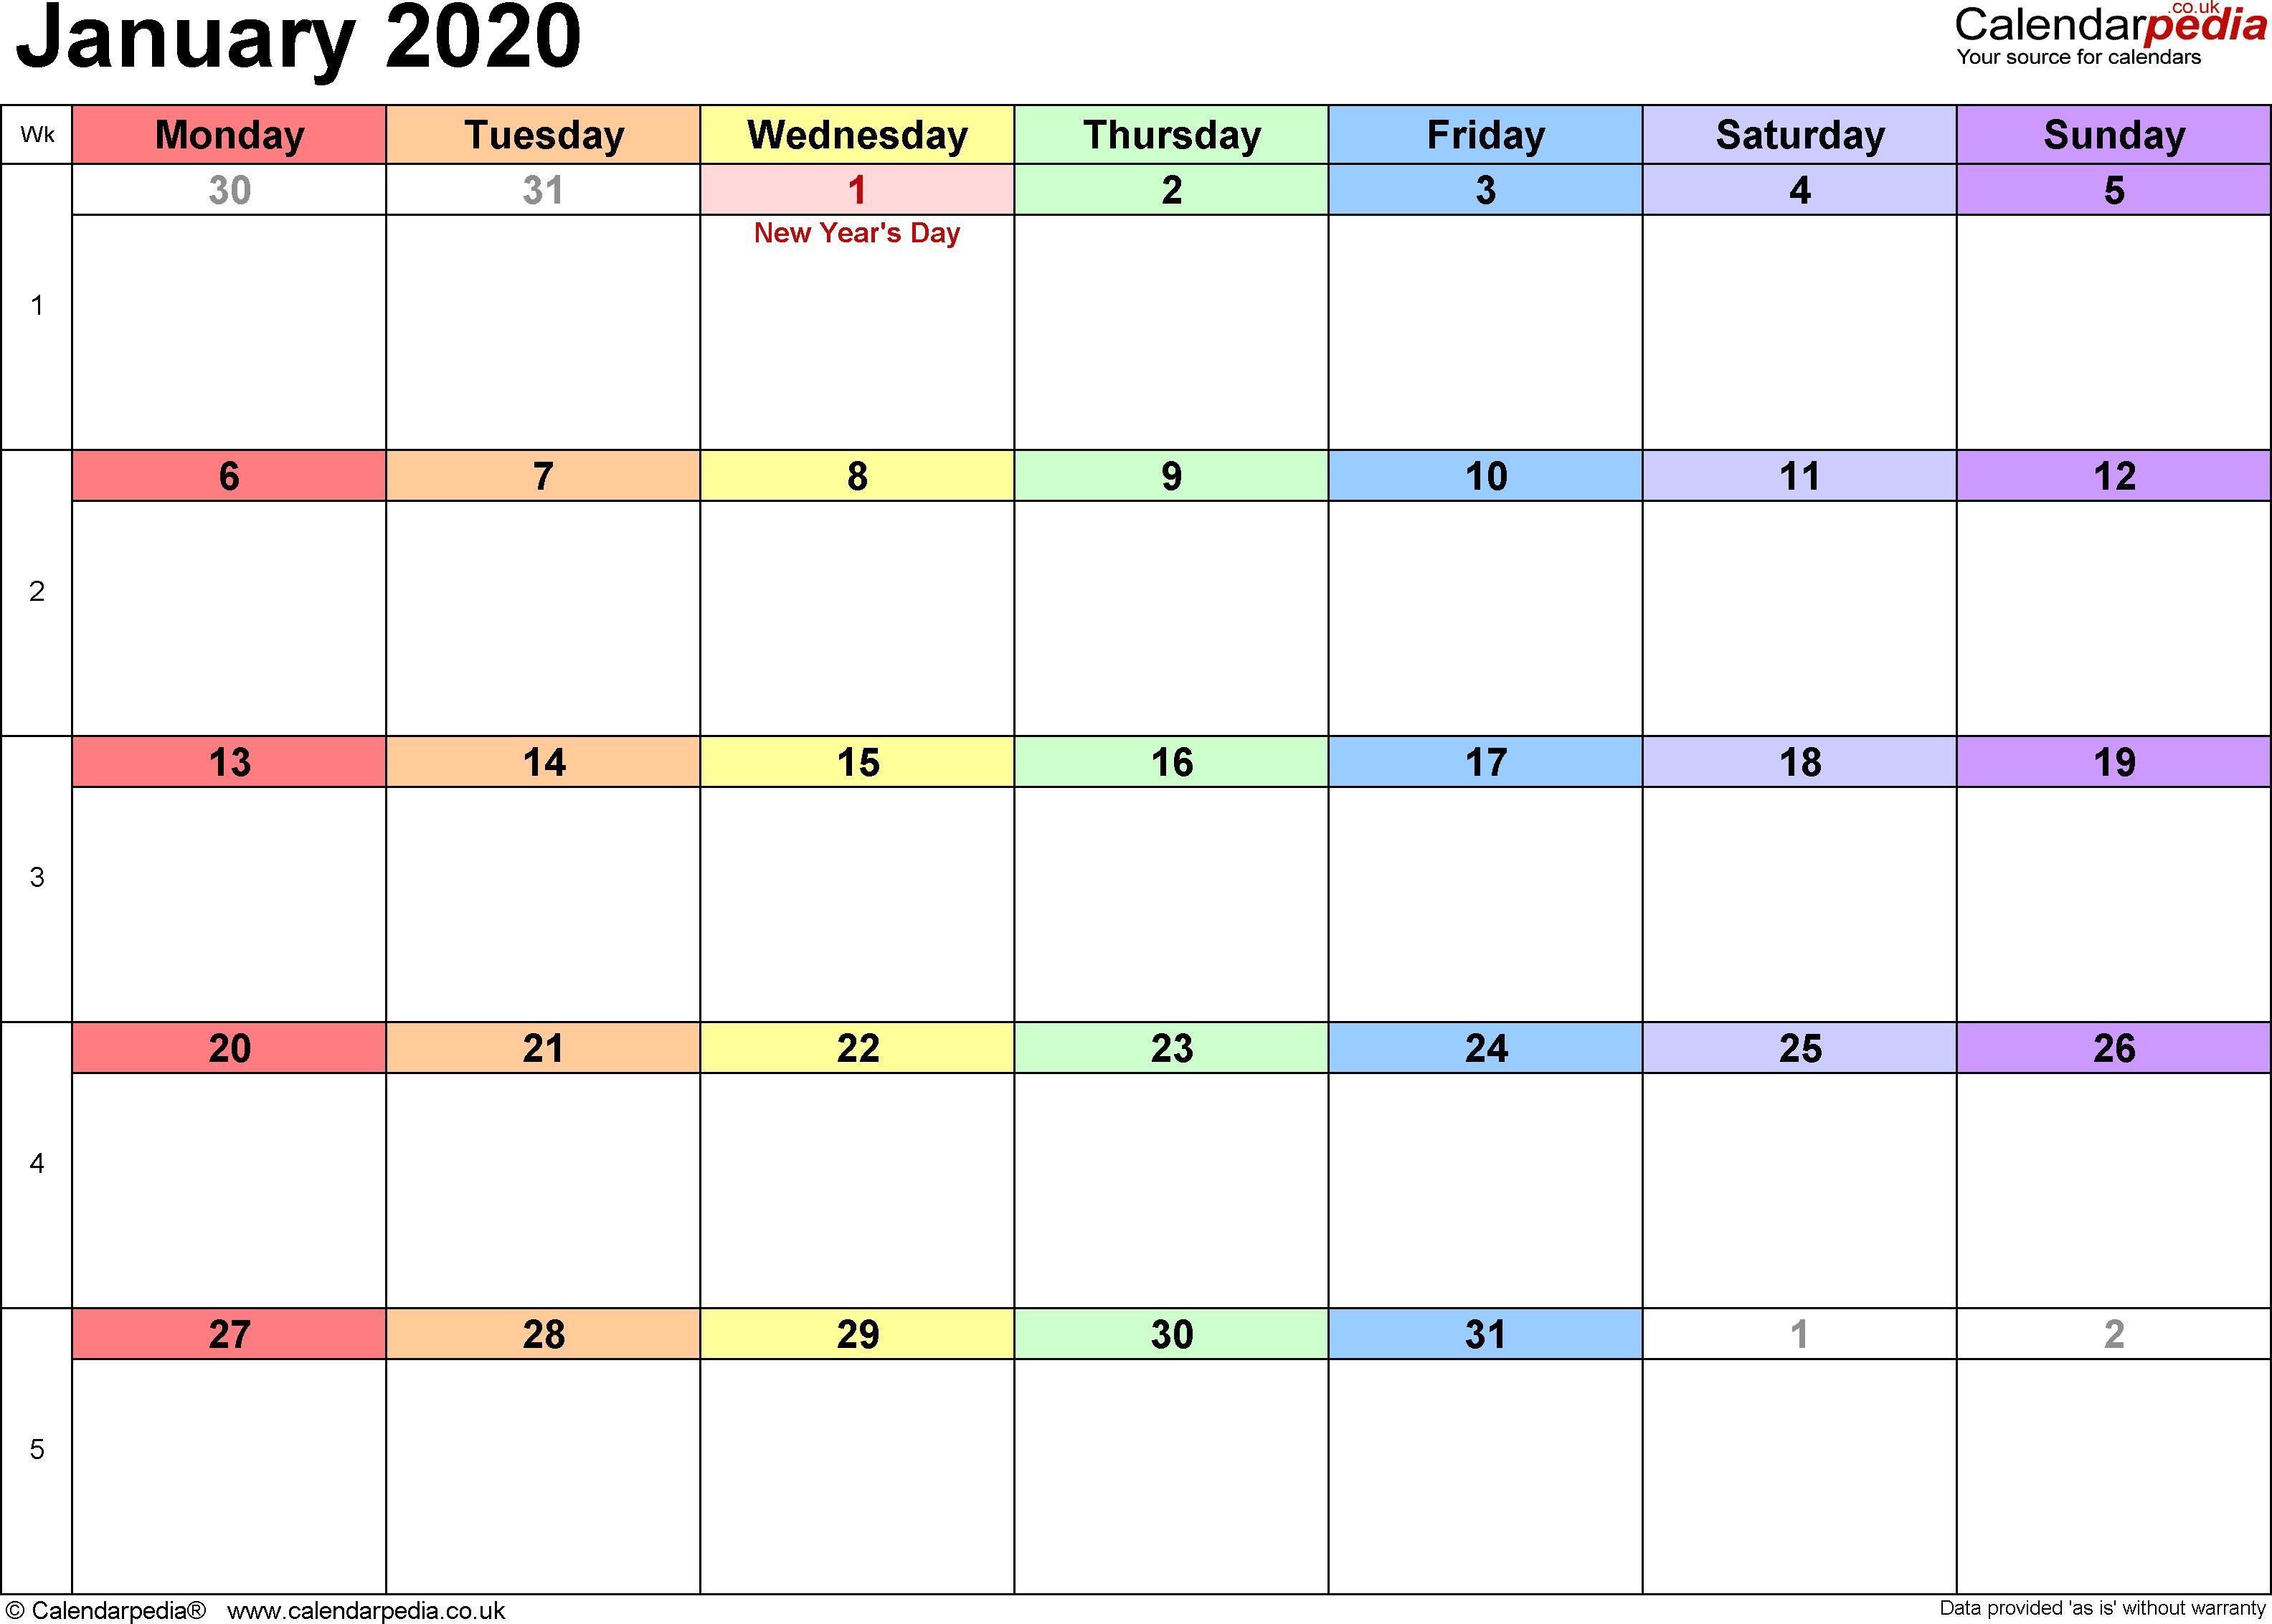 Calendar January 2020 Uk, Bank Holidays, Excel/pdf/word-January Calendar For 2020